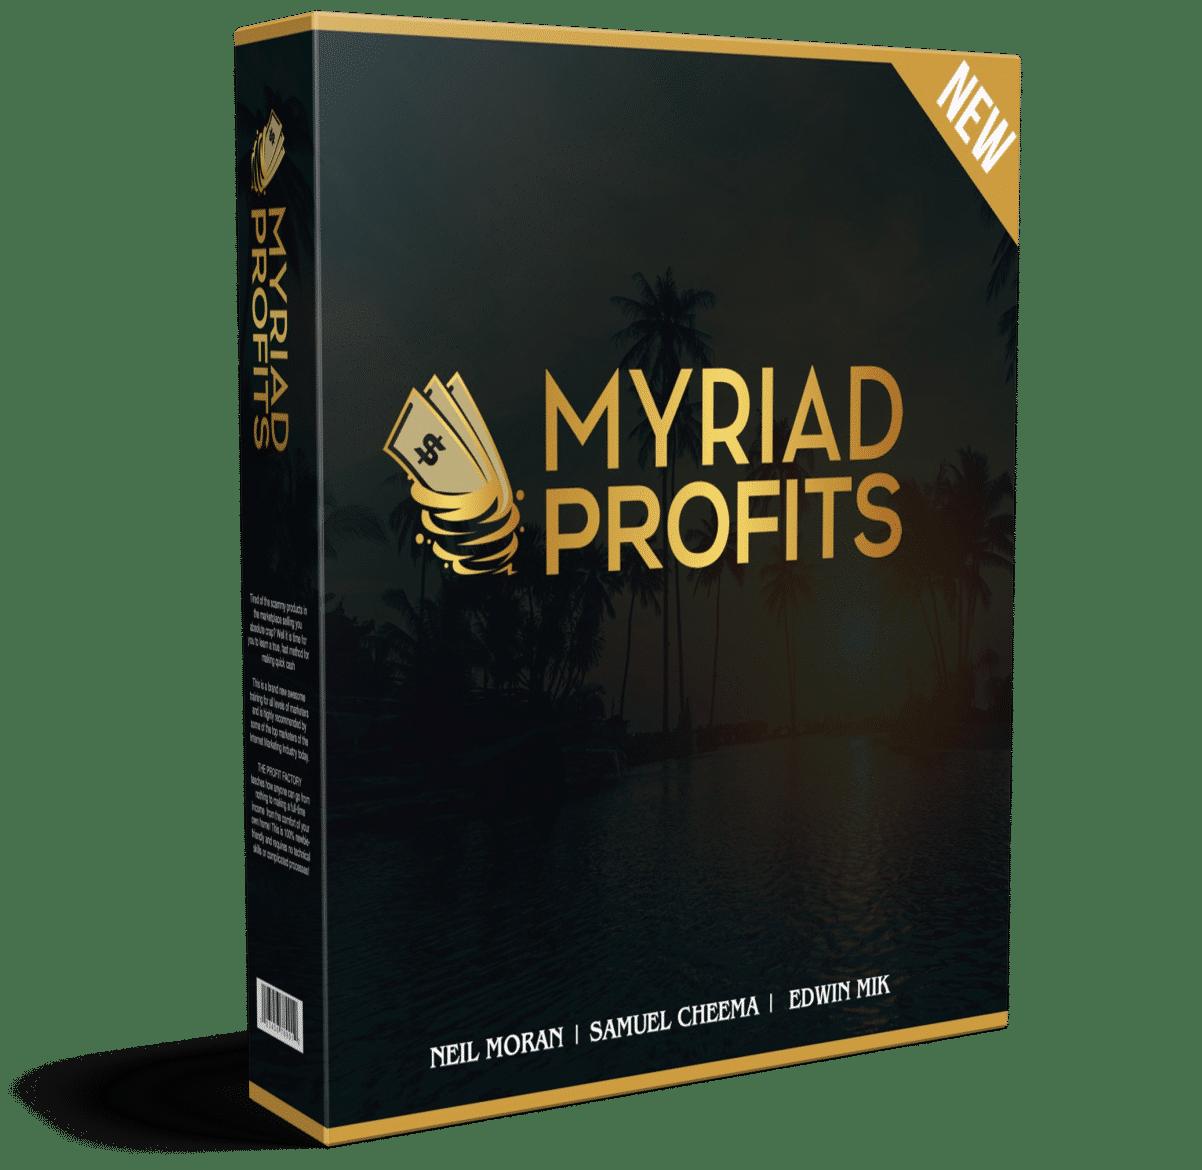 MyRiad Profits